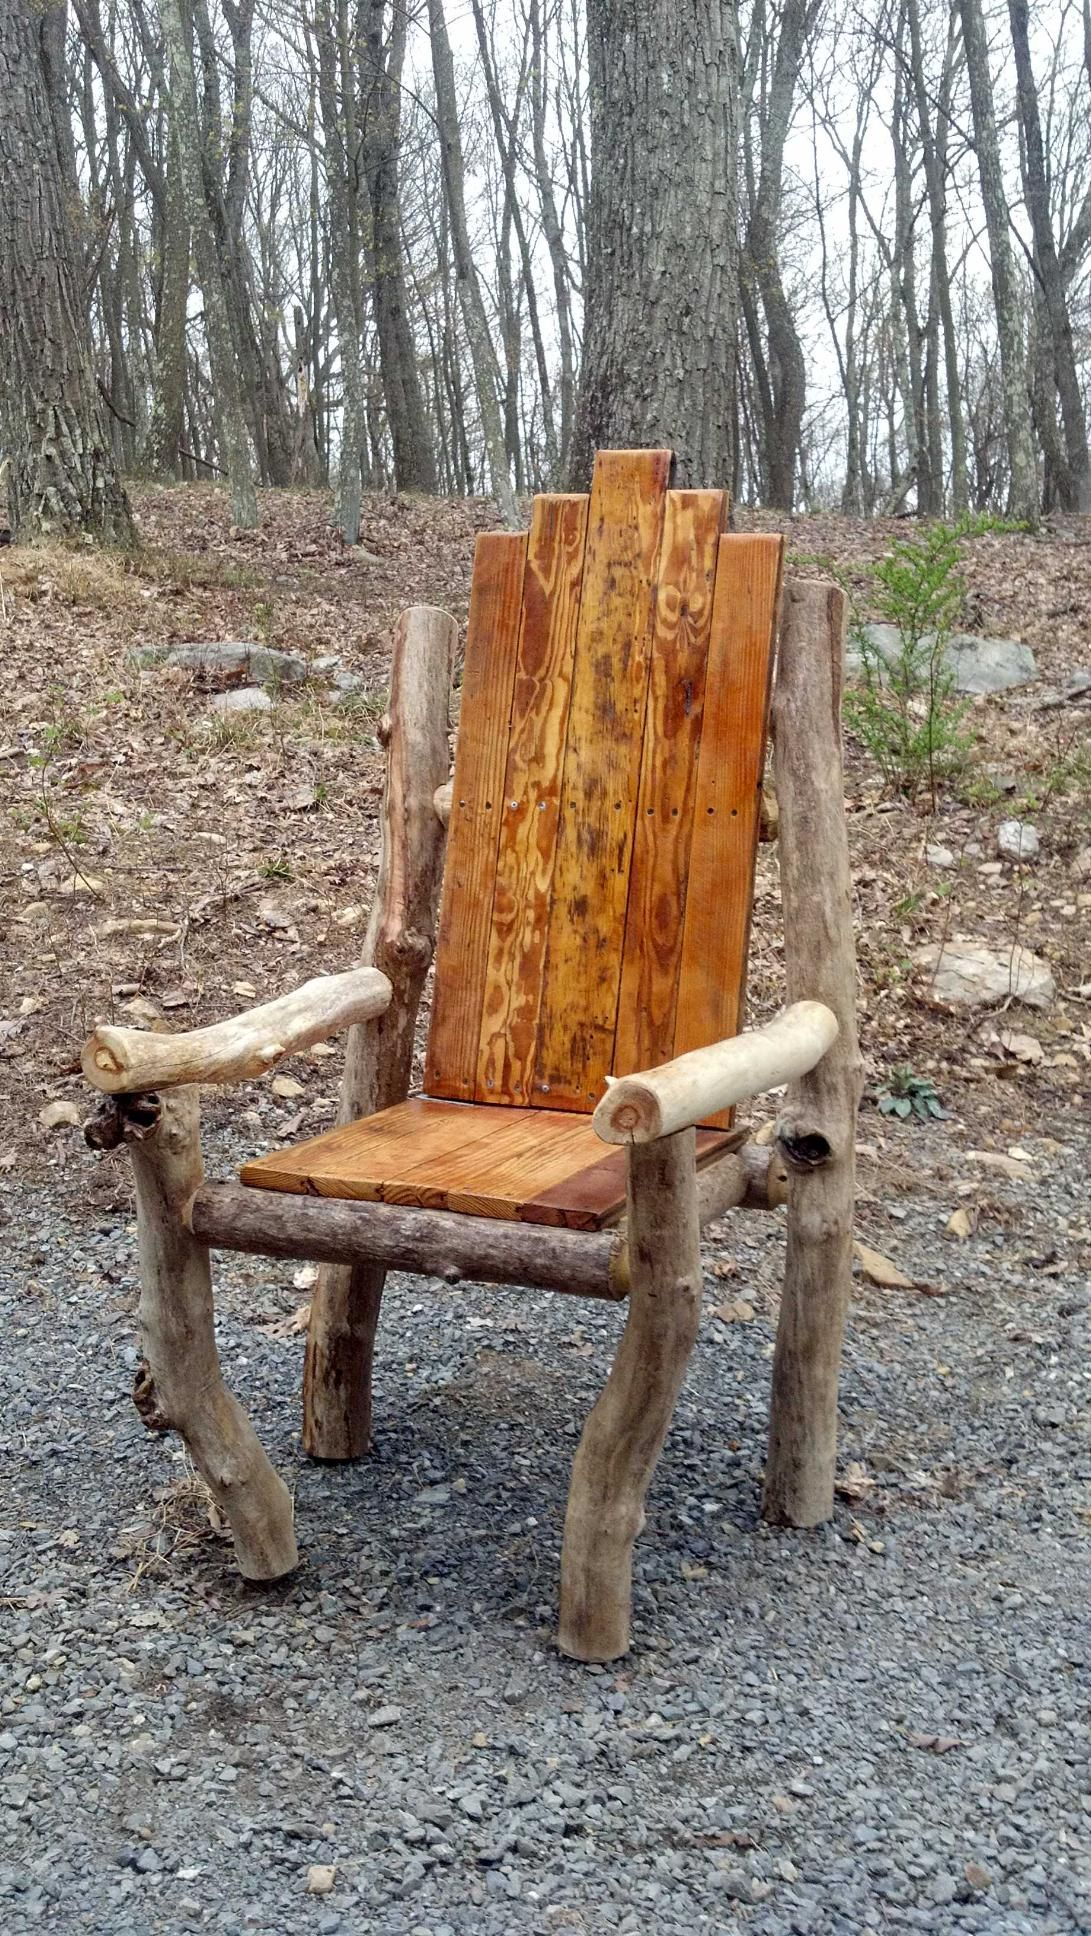 stuhl aus esten woodworking rustic pallet projects. Black Bedroom Furniture Sets. Home Design Ideas